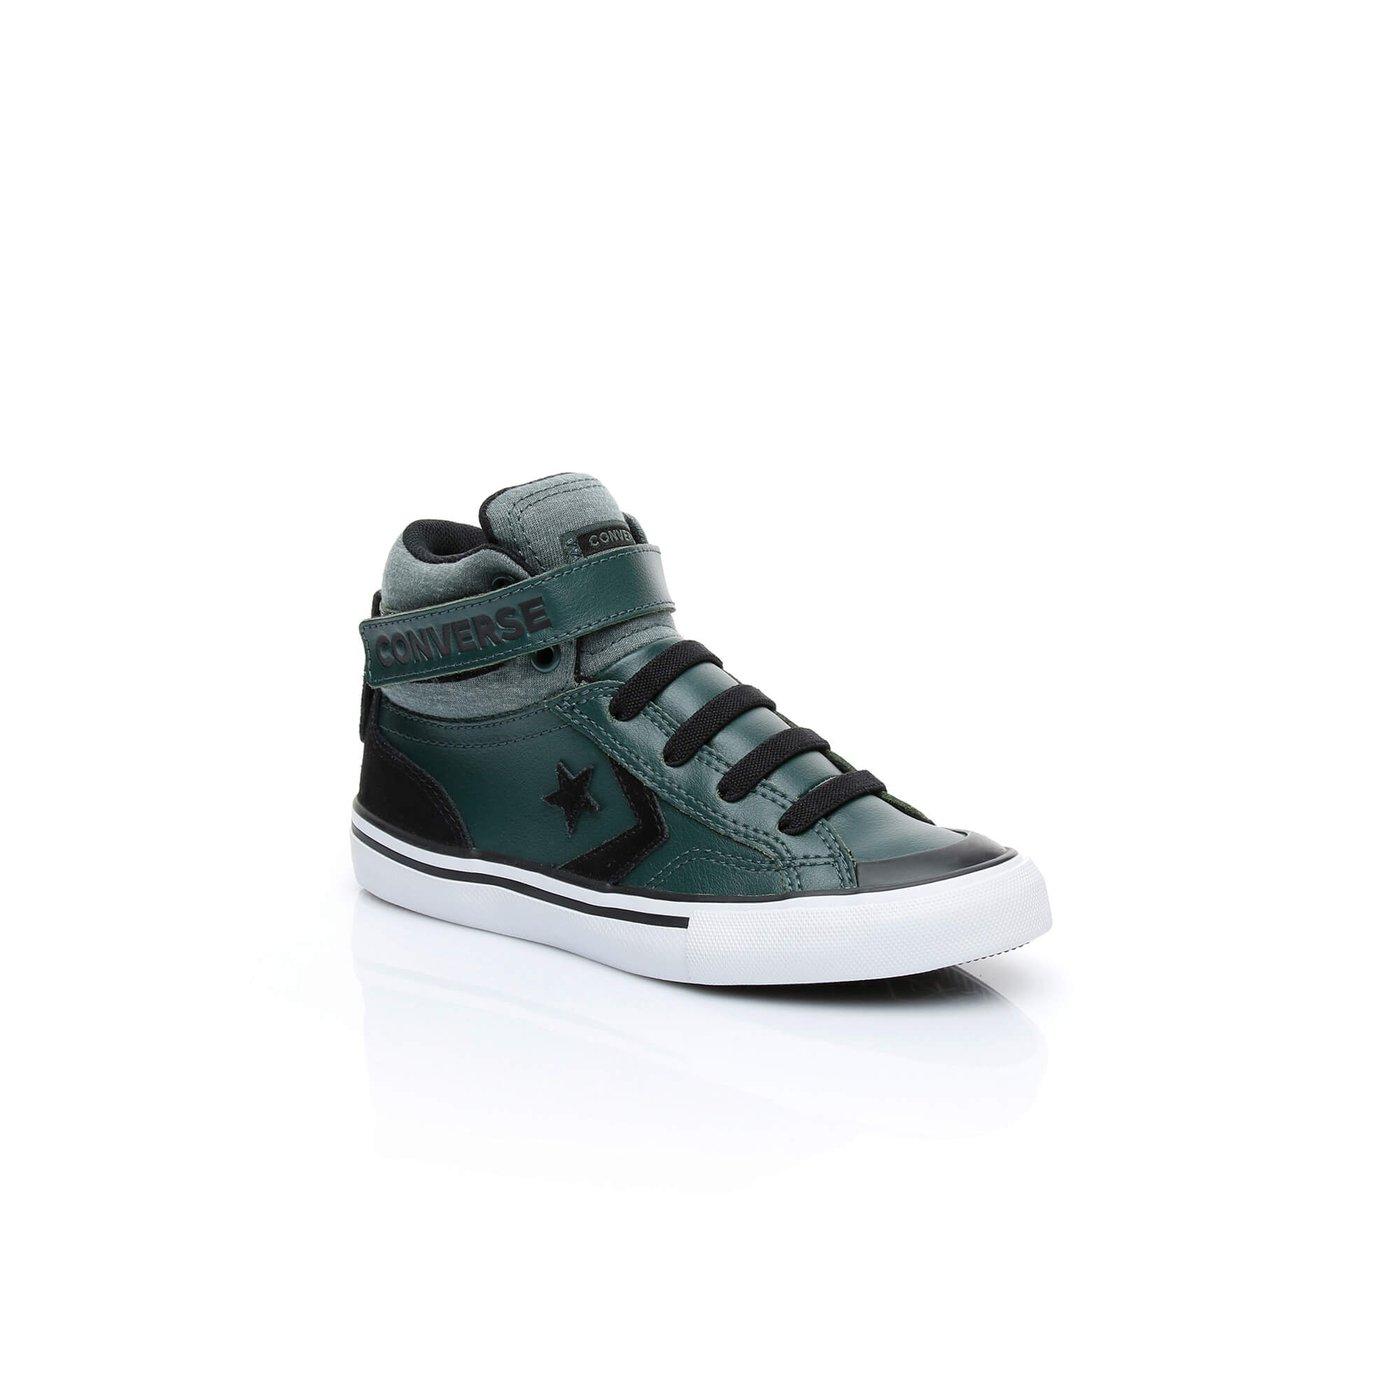 Converse Pro Blaze Strap Mid Çocuk Yeşil Sneaker